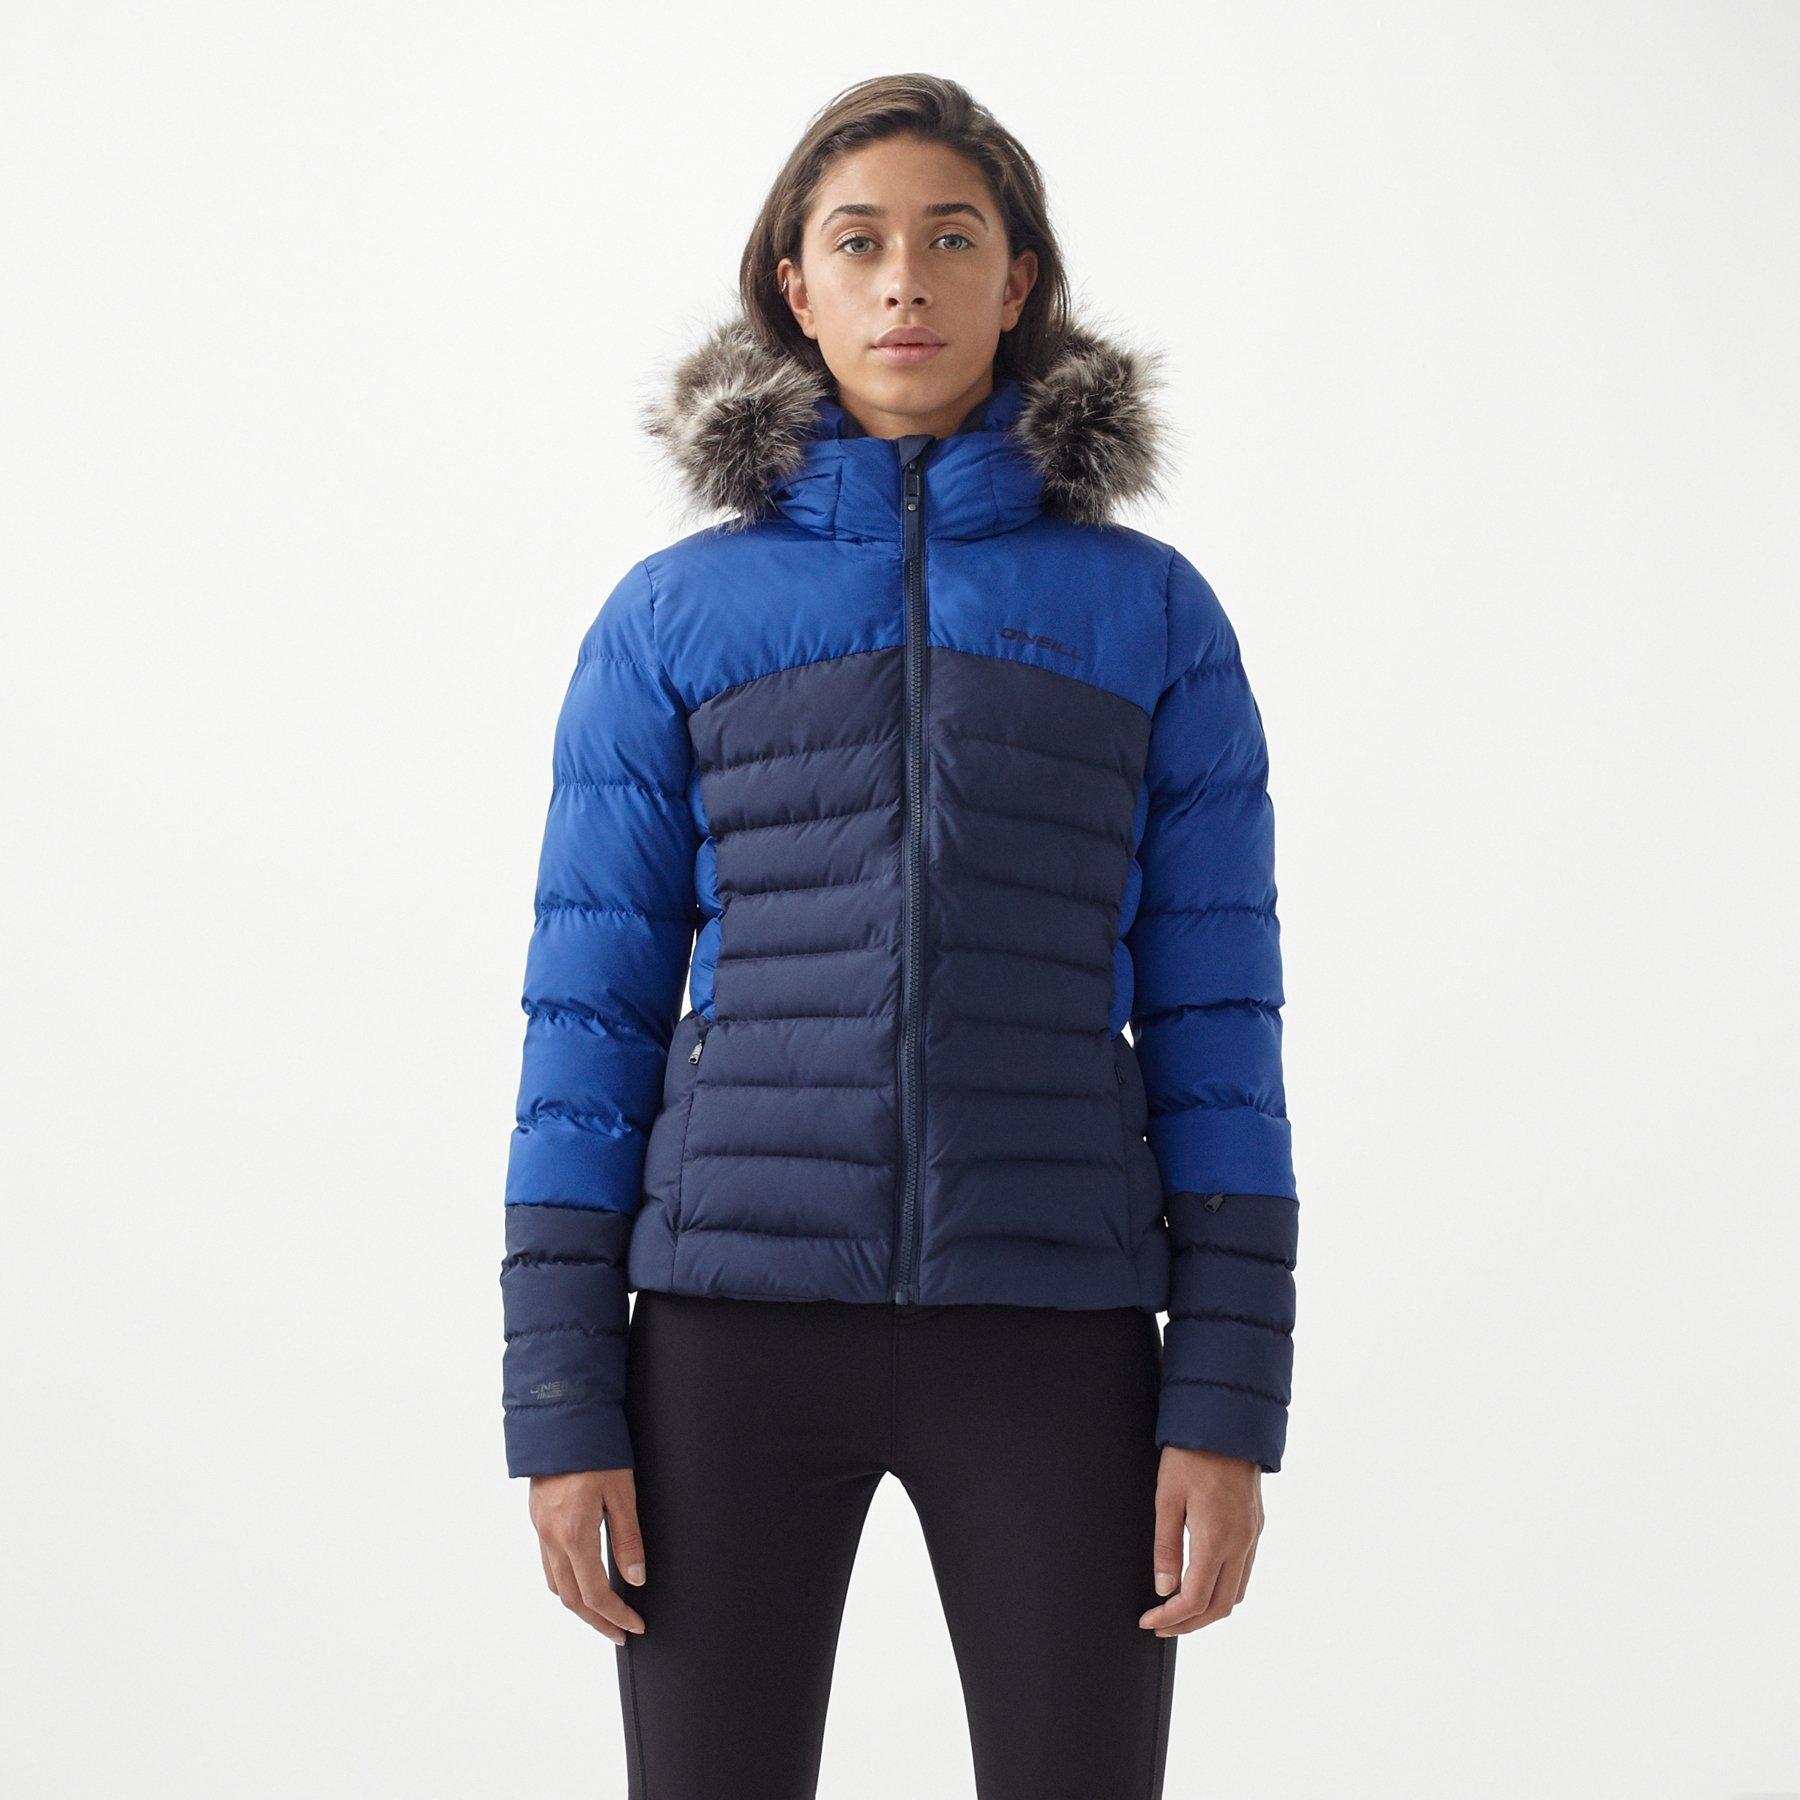 O'neill Ski jas »Phase« bestellen: 14 dagen bedenktijd